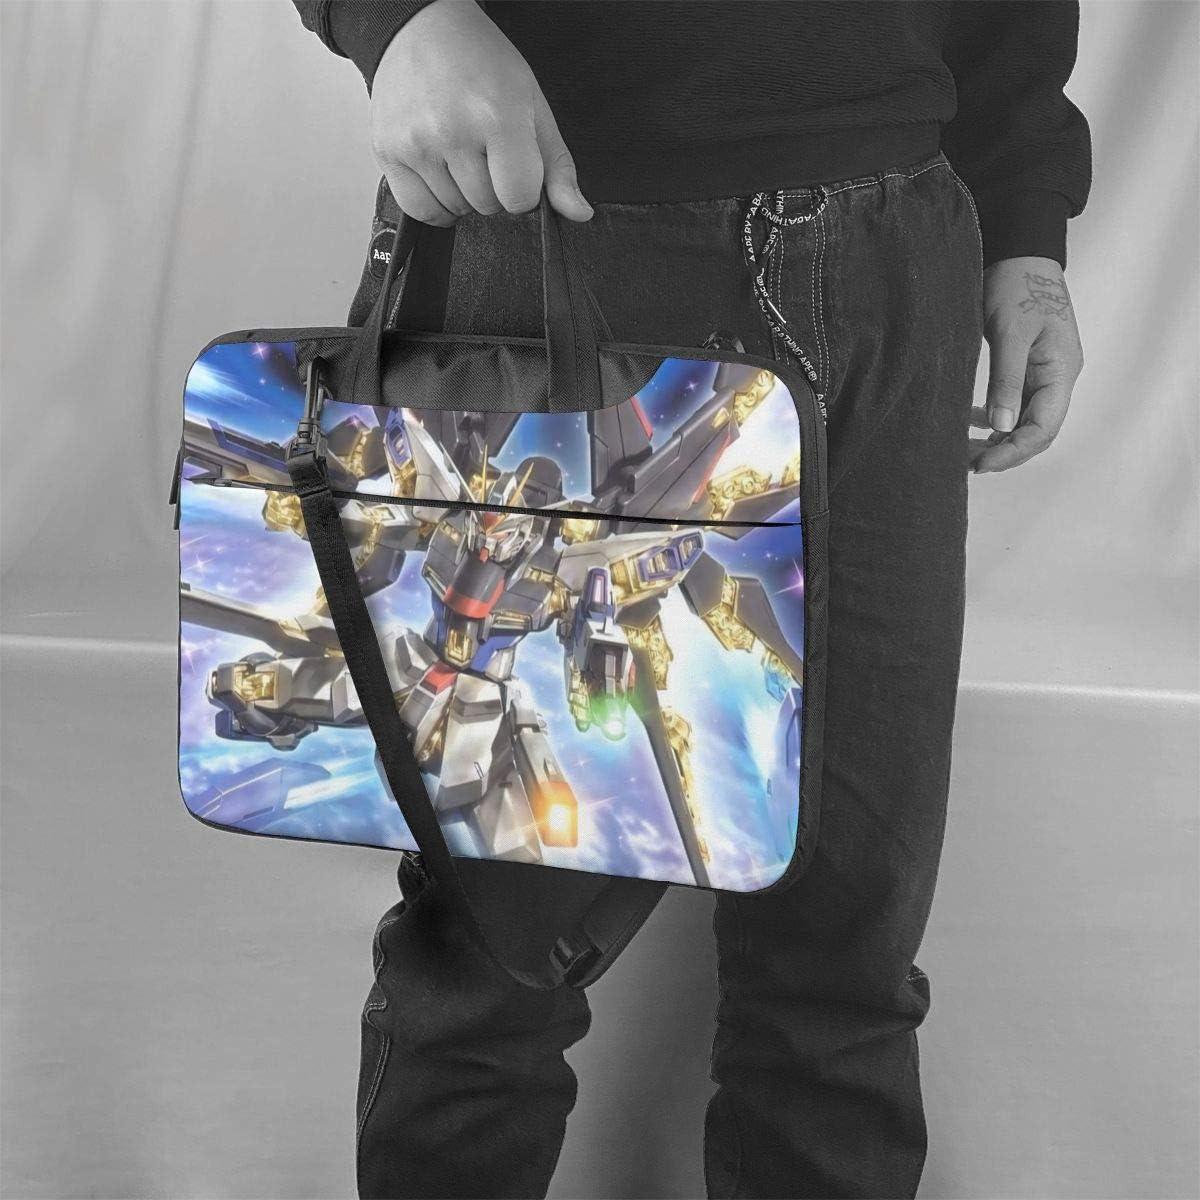 Mobile Suit Gundam Laptop Bags for Men and Women Big Business Briefcases Travel Messenger Shoulder Bag Computer Backpack Fit 13 14 15.6 Inch Laptop and Notebook Black,15.6 Inch